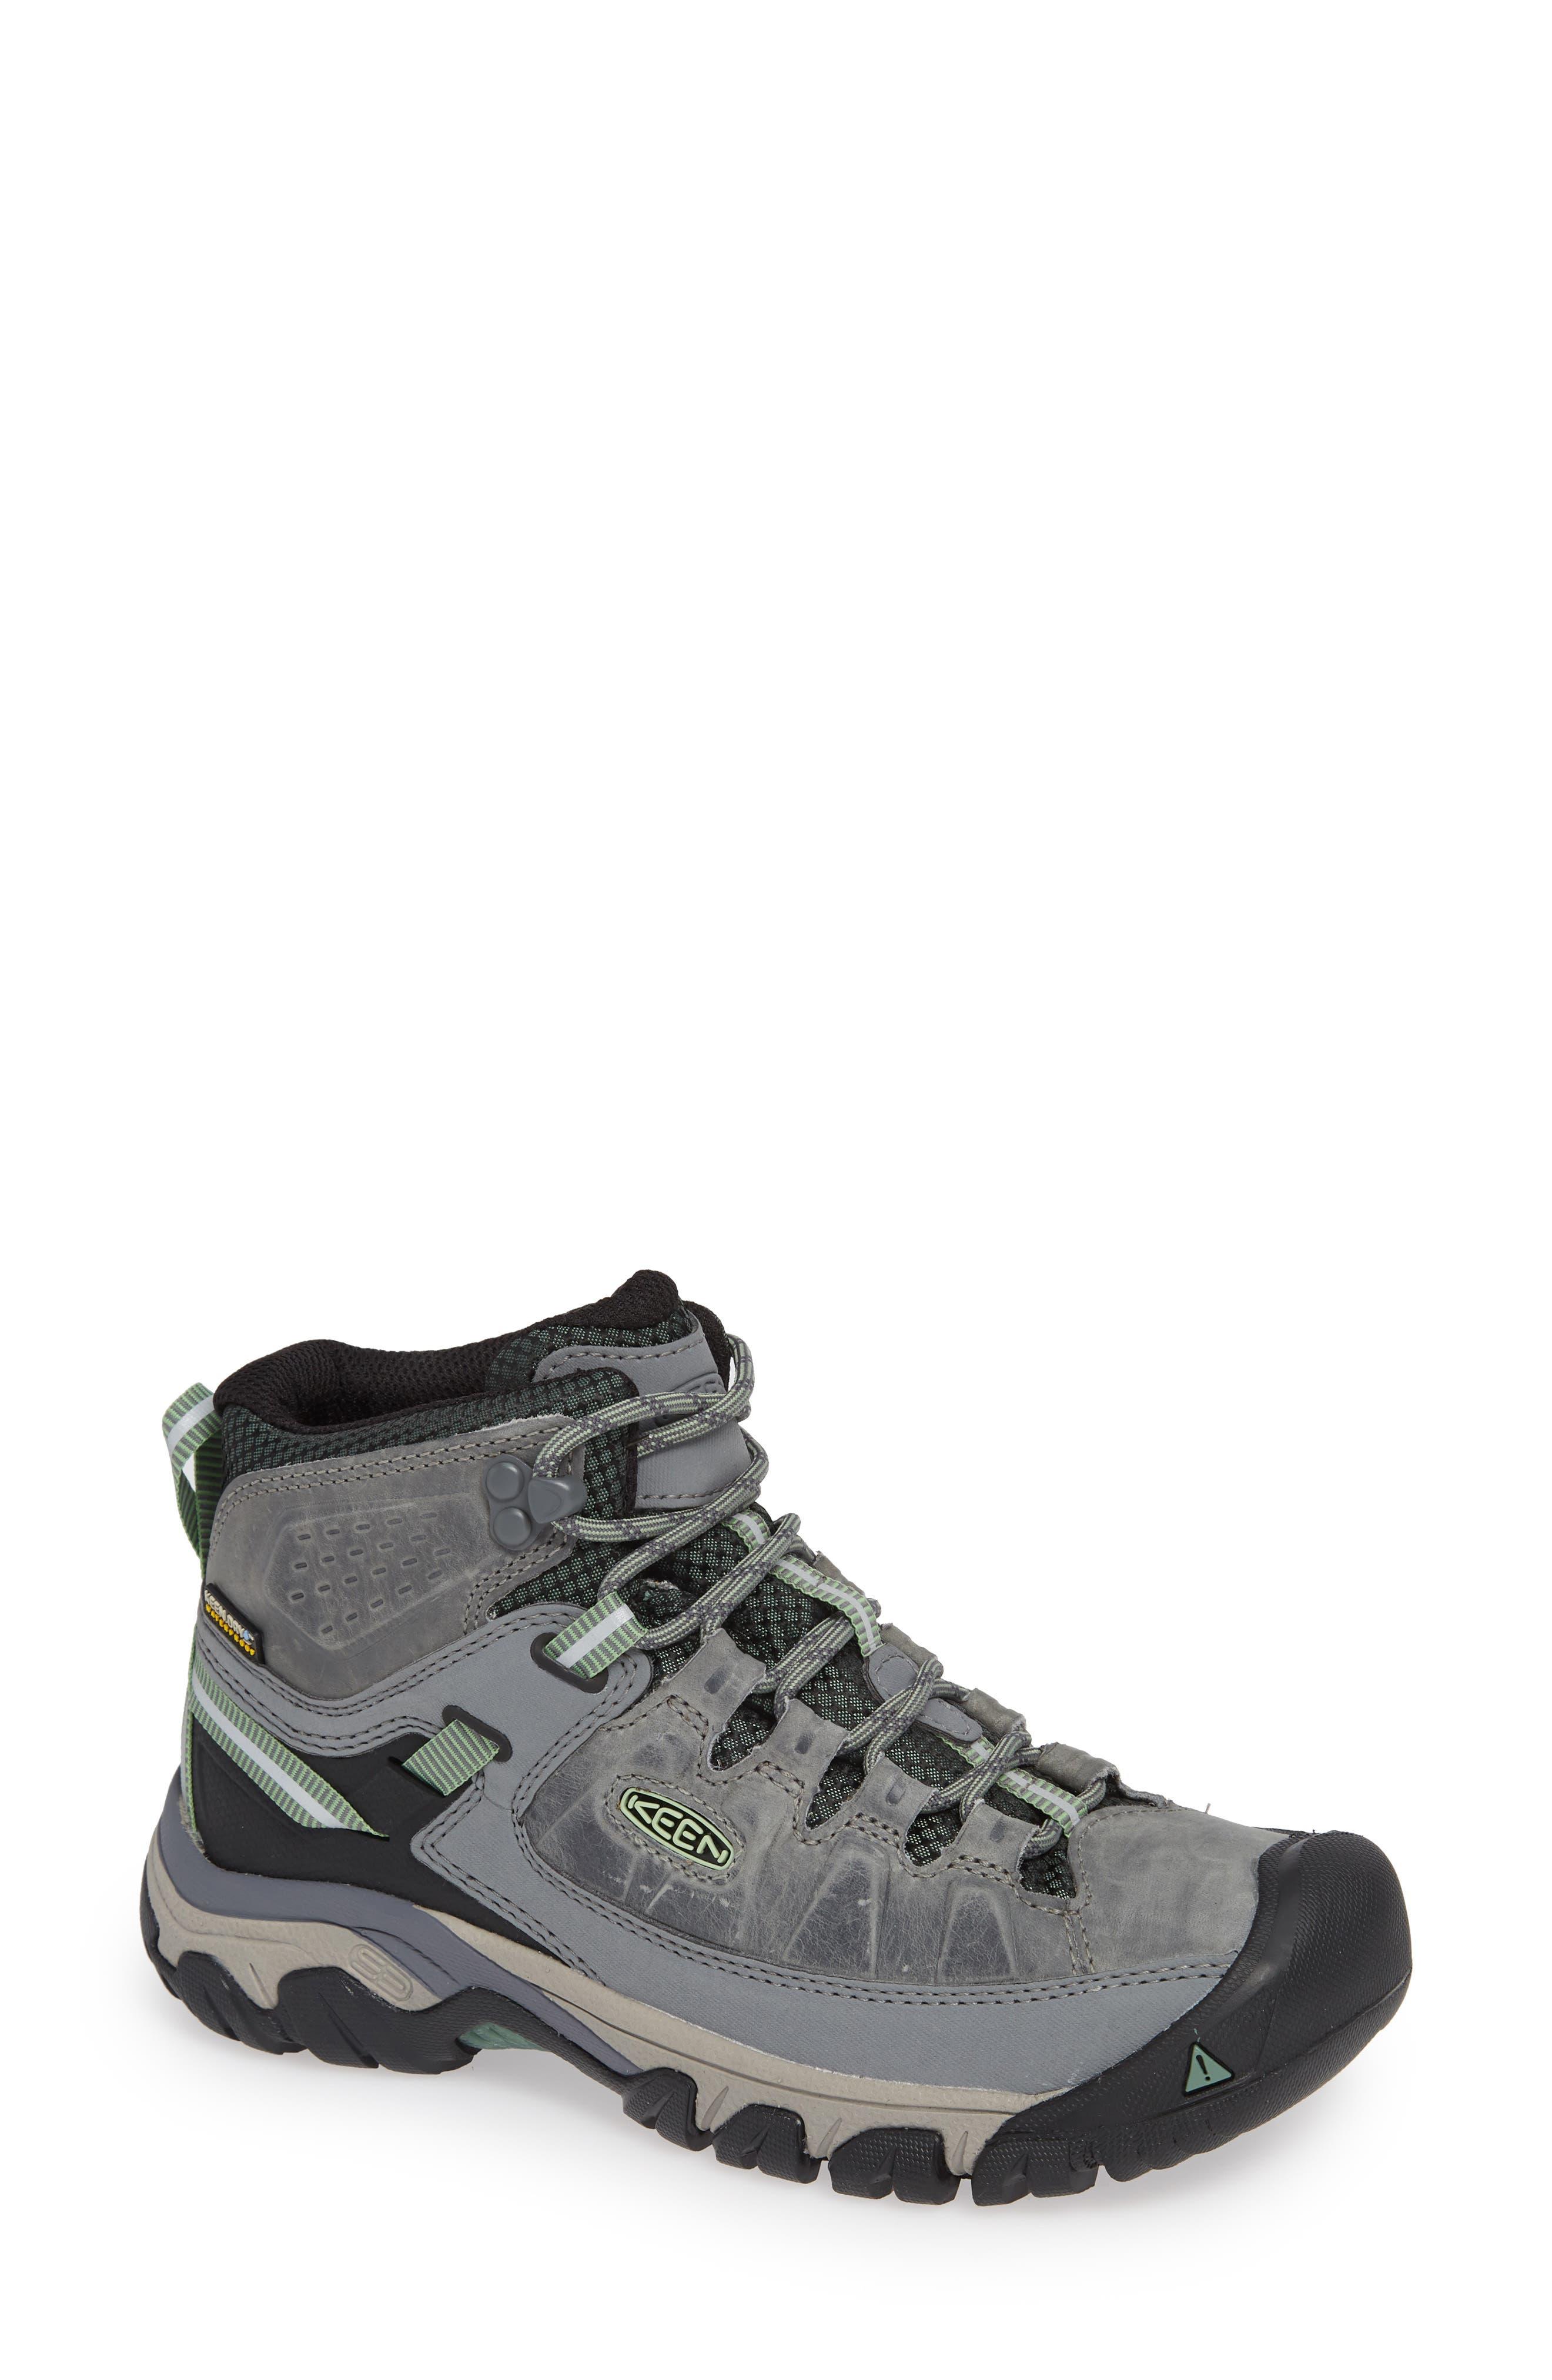 Targhee III Mid Waterproof Hiking Boot,                         Main,                         color, BLEACHER/ DUCK GREEN LEATHER